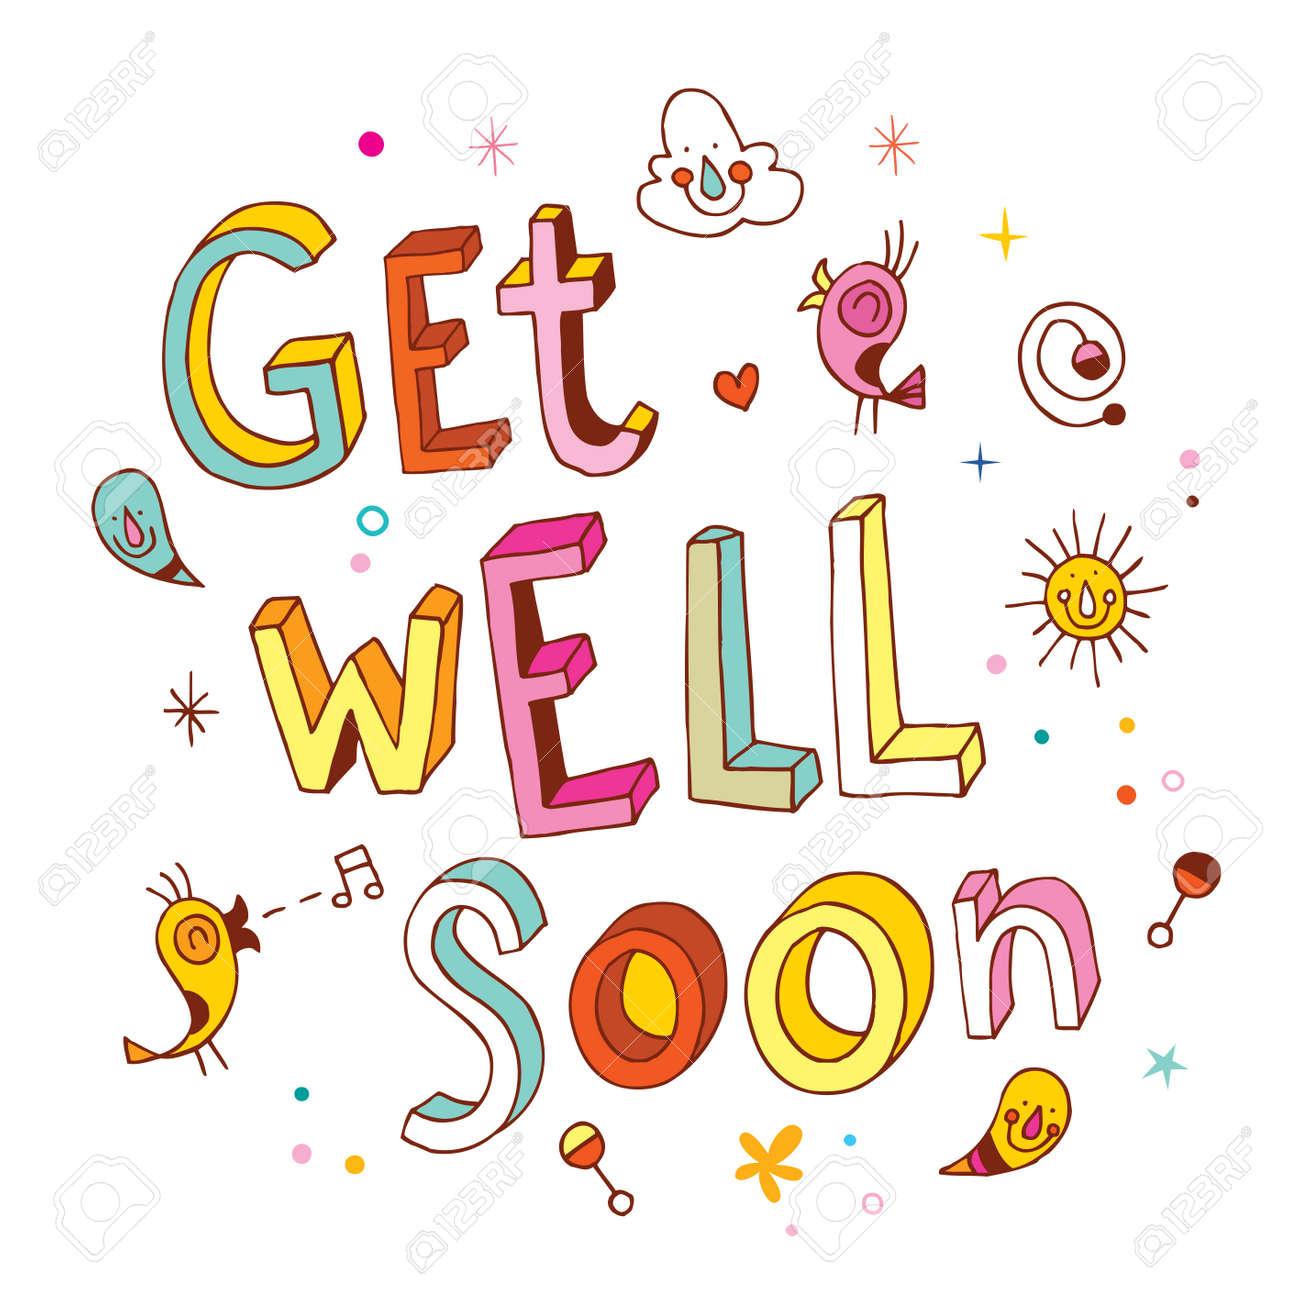 Get well soon - 55590134